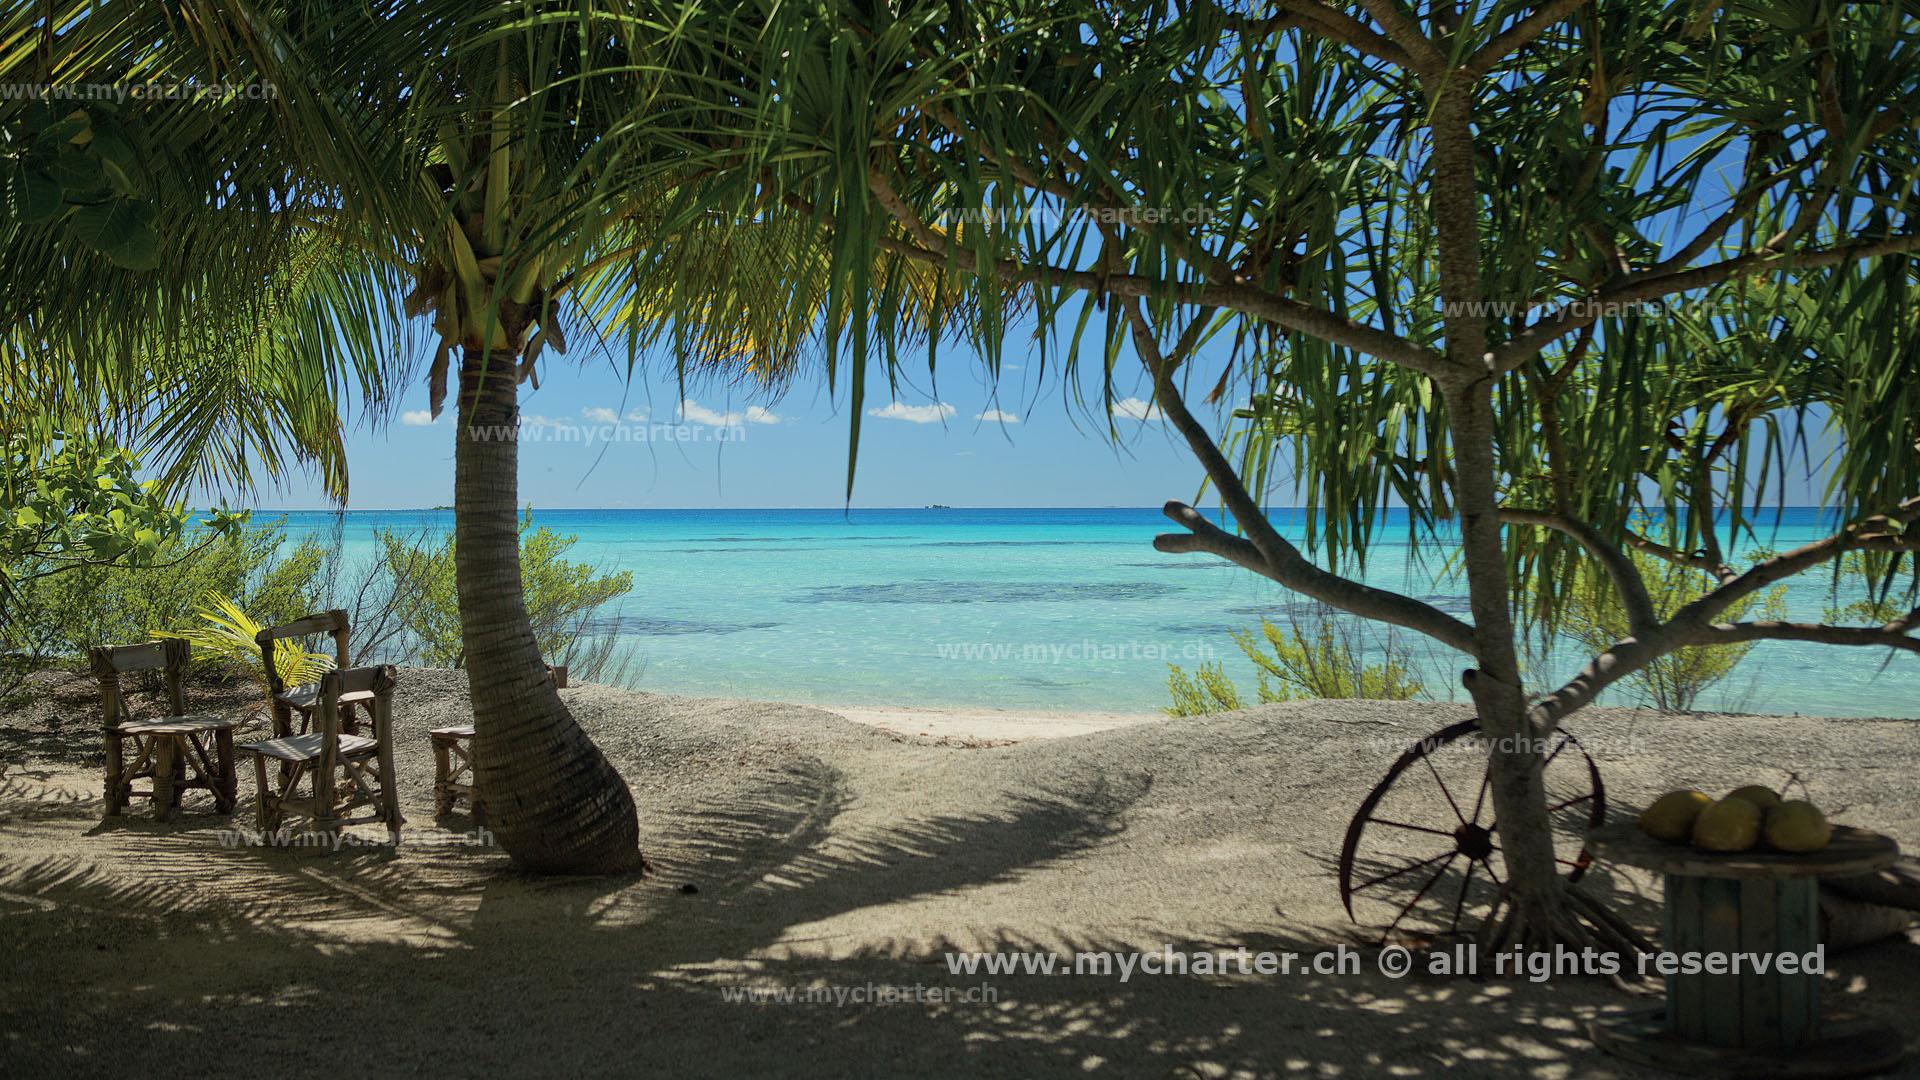 Toern Tahiti Insel Tikehau